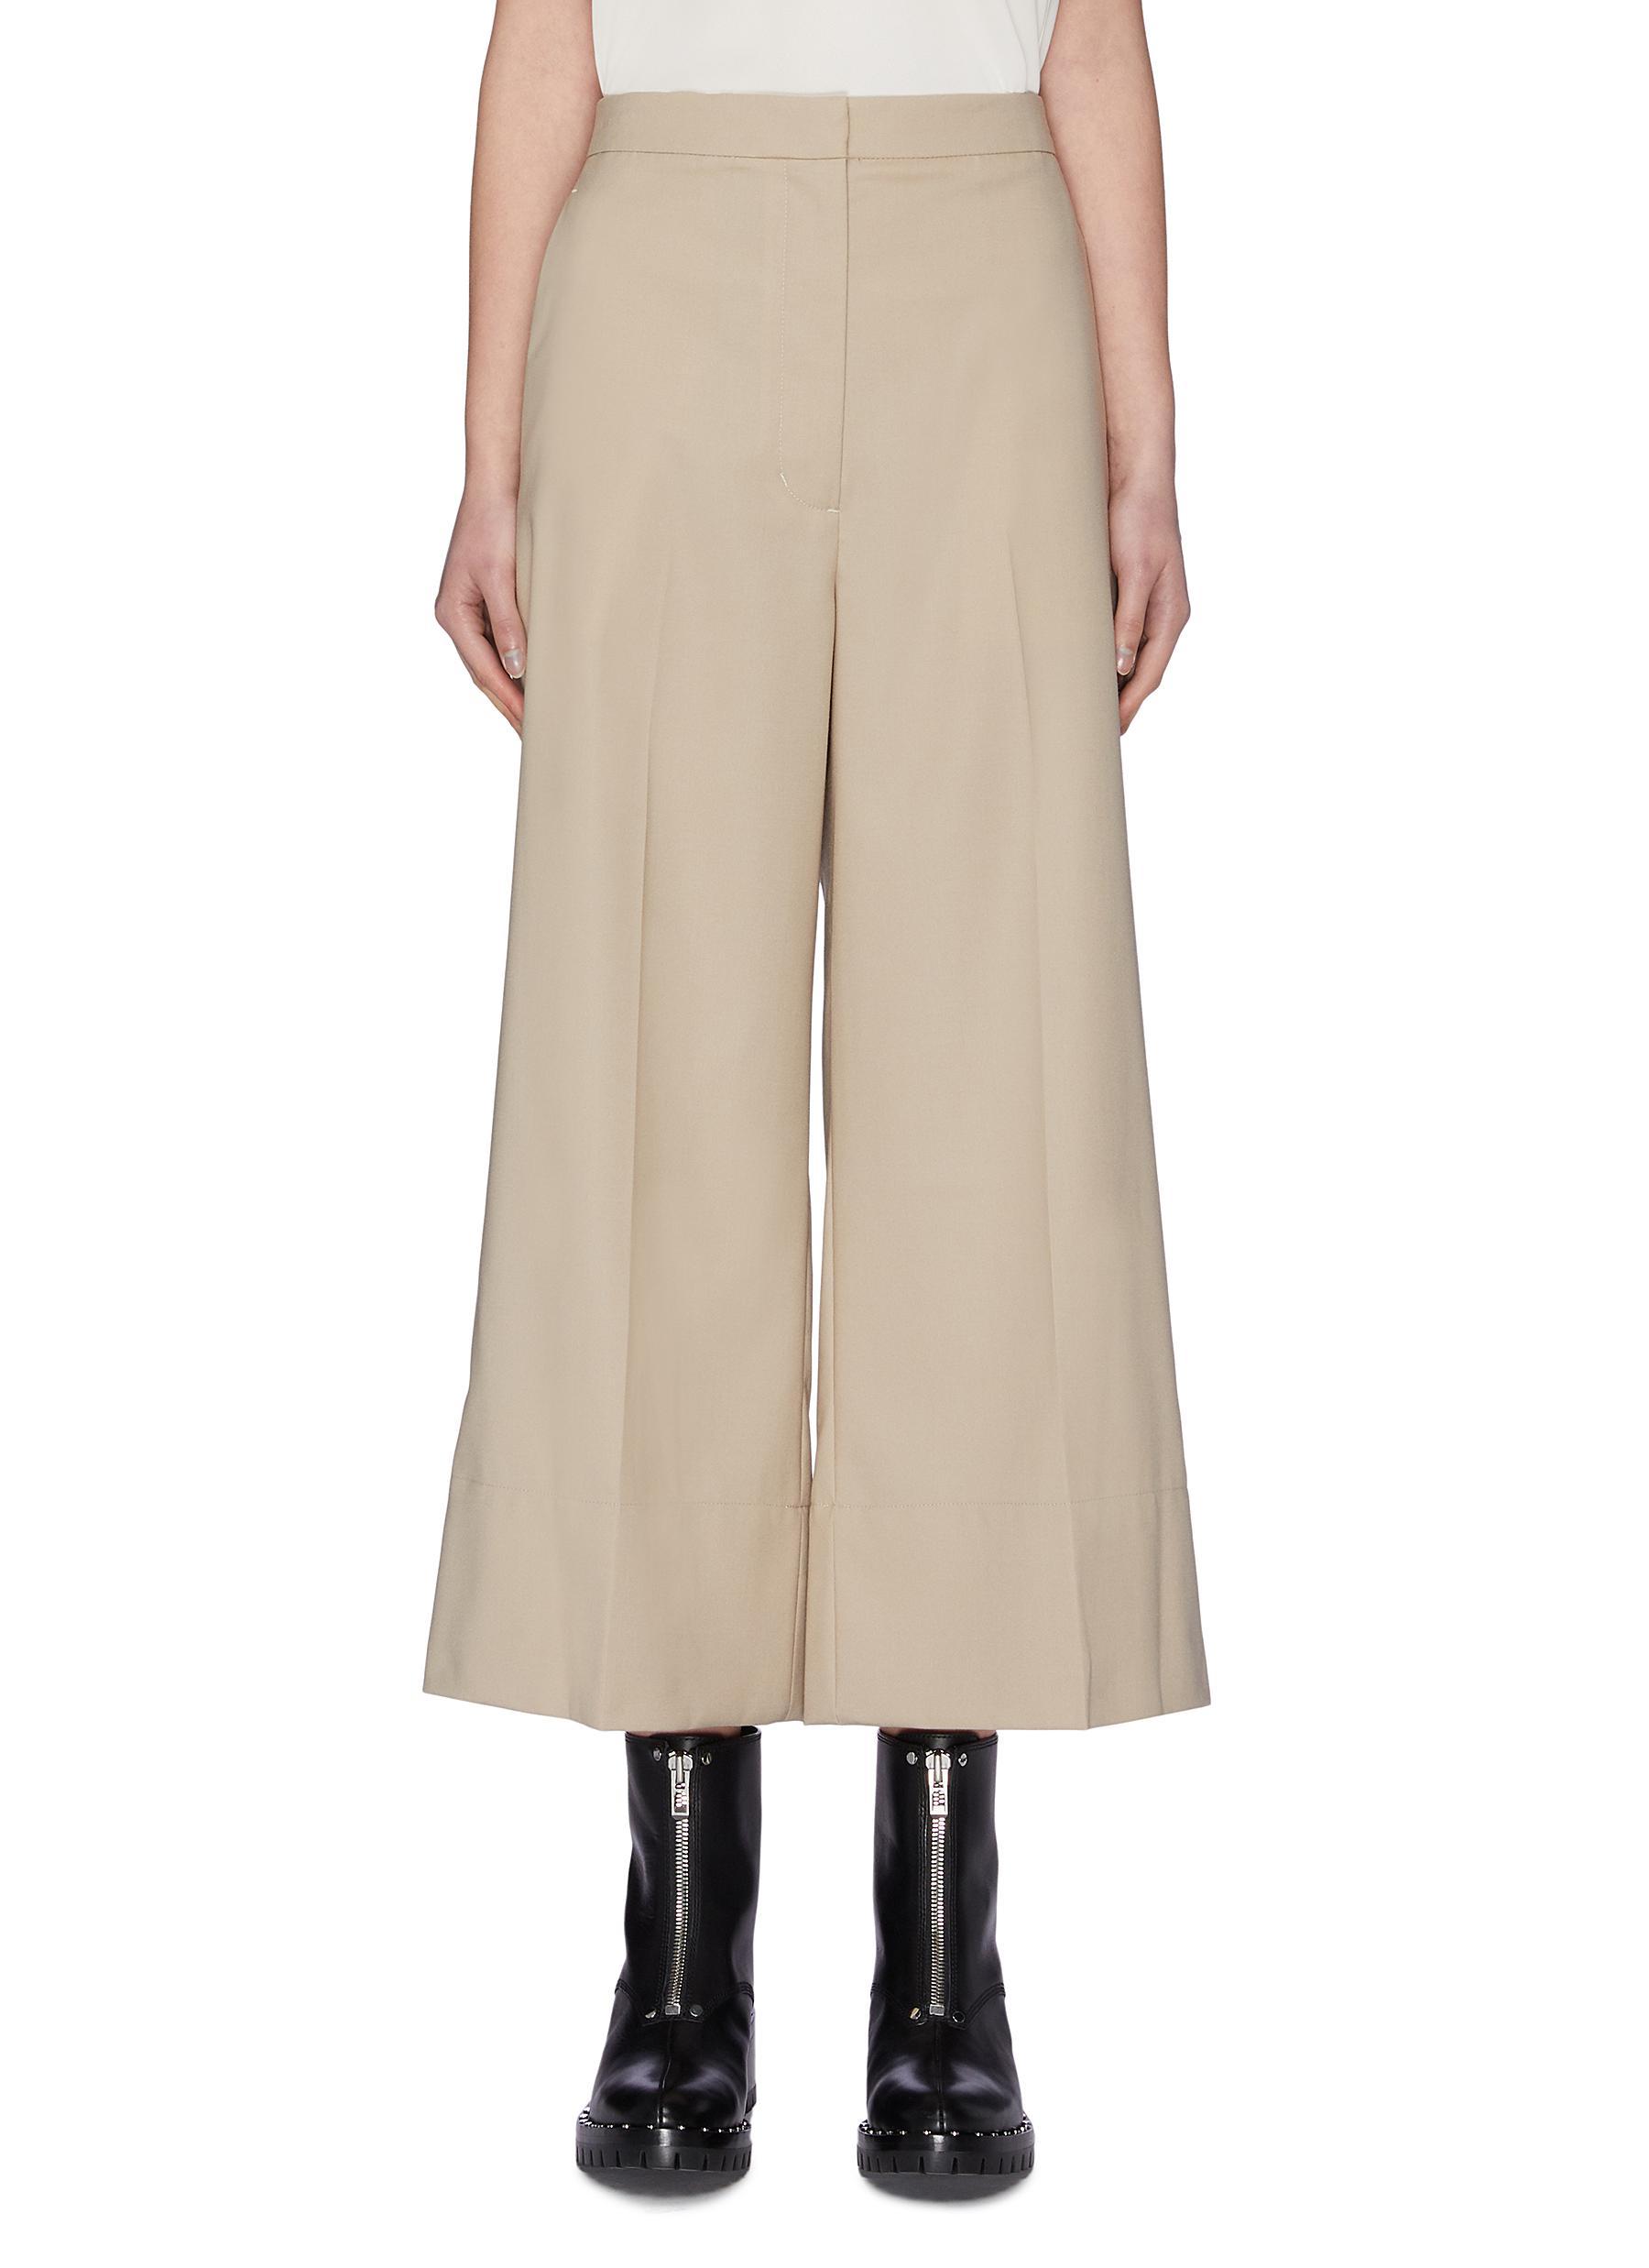 Buy 3.1 Phillip Lim Pants & Shorts A-line back dart crop wool pants